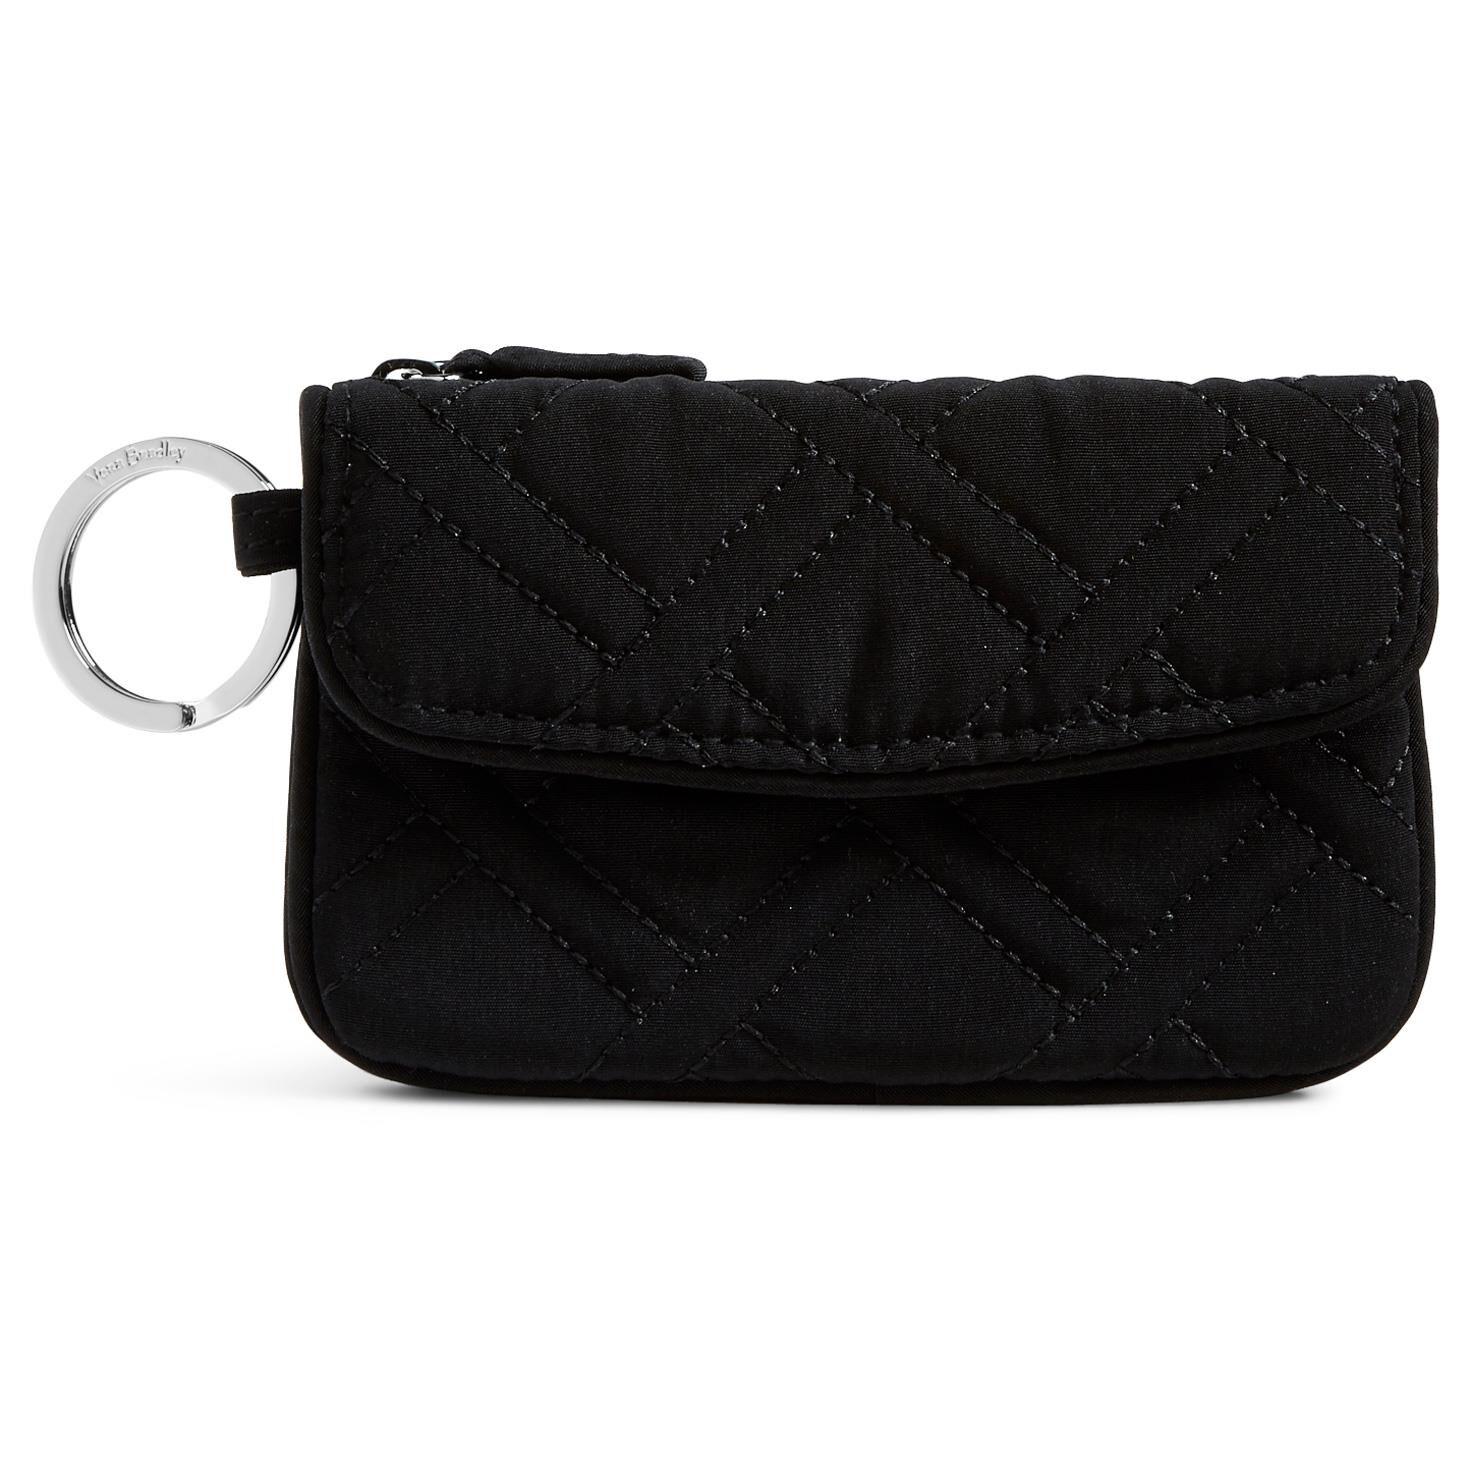 Vera Bradley Jen Zip ID Case in Classic Black - Handbags & Purses ...